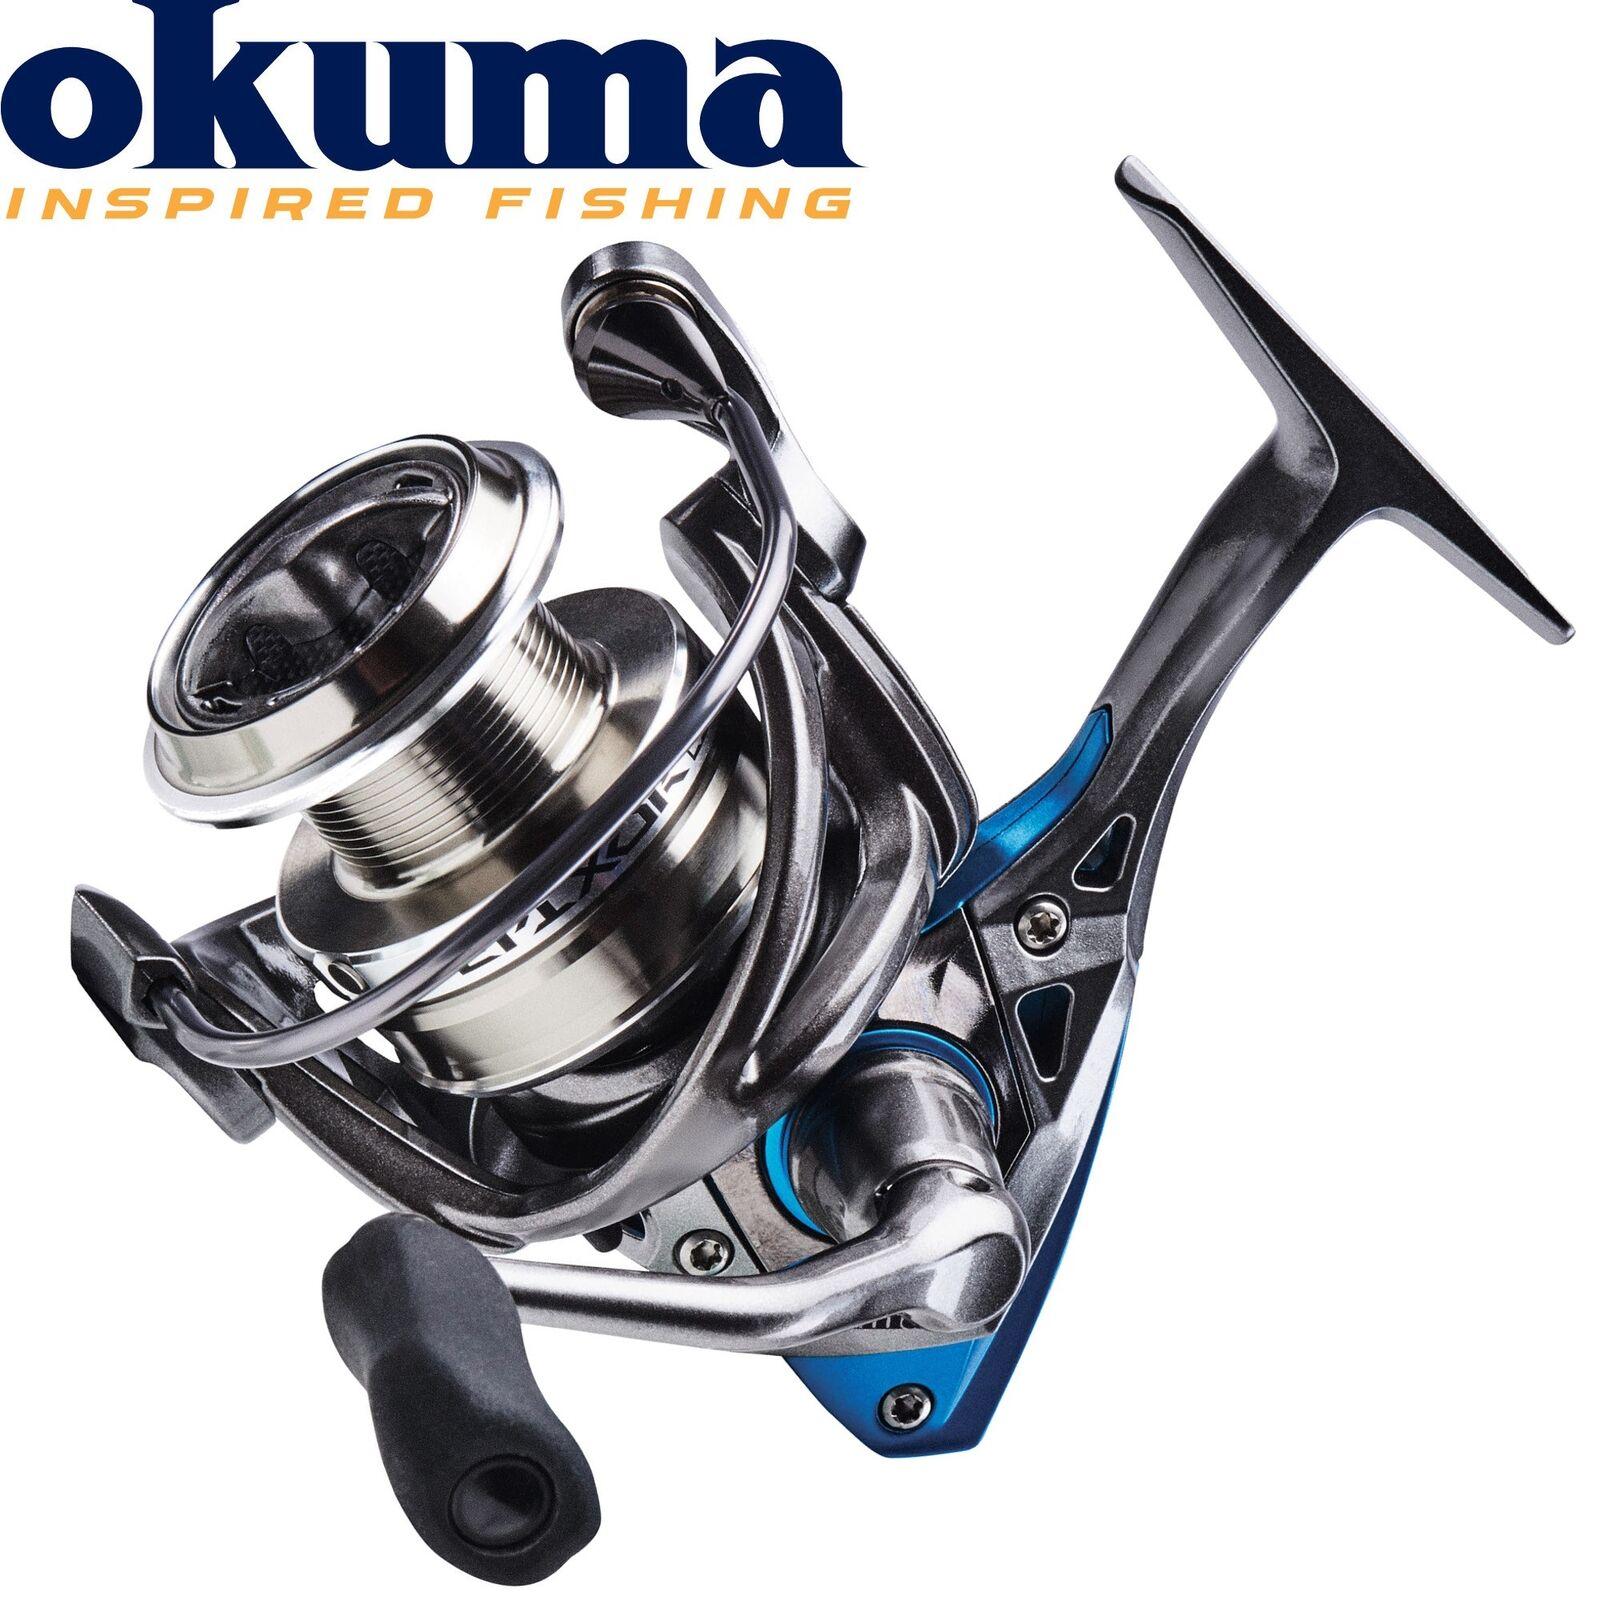 OKUMA Epixor LS spinning epl-30 - pesca, spinnrolle per persico pesca, - stazionario ruolo c5be2c